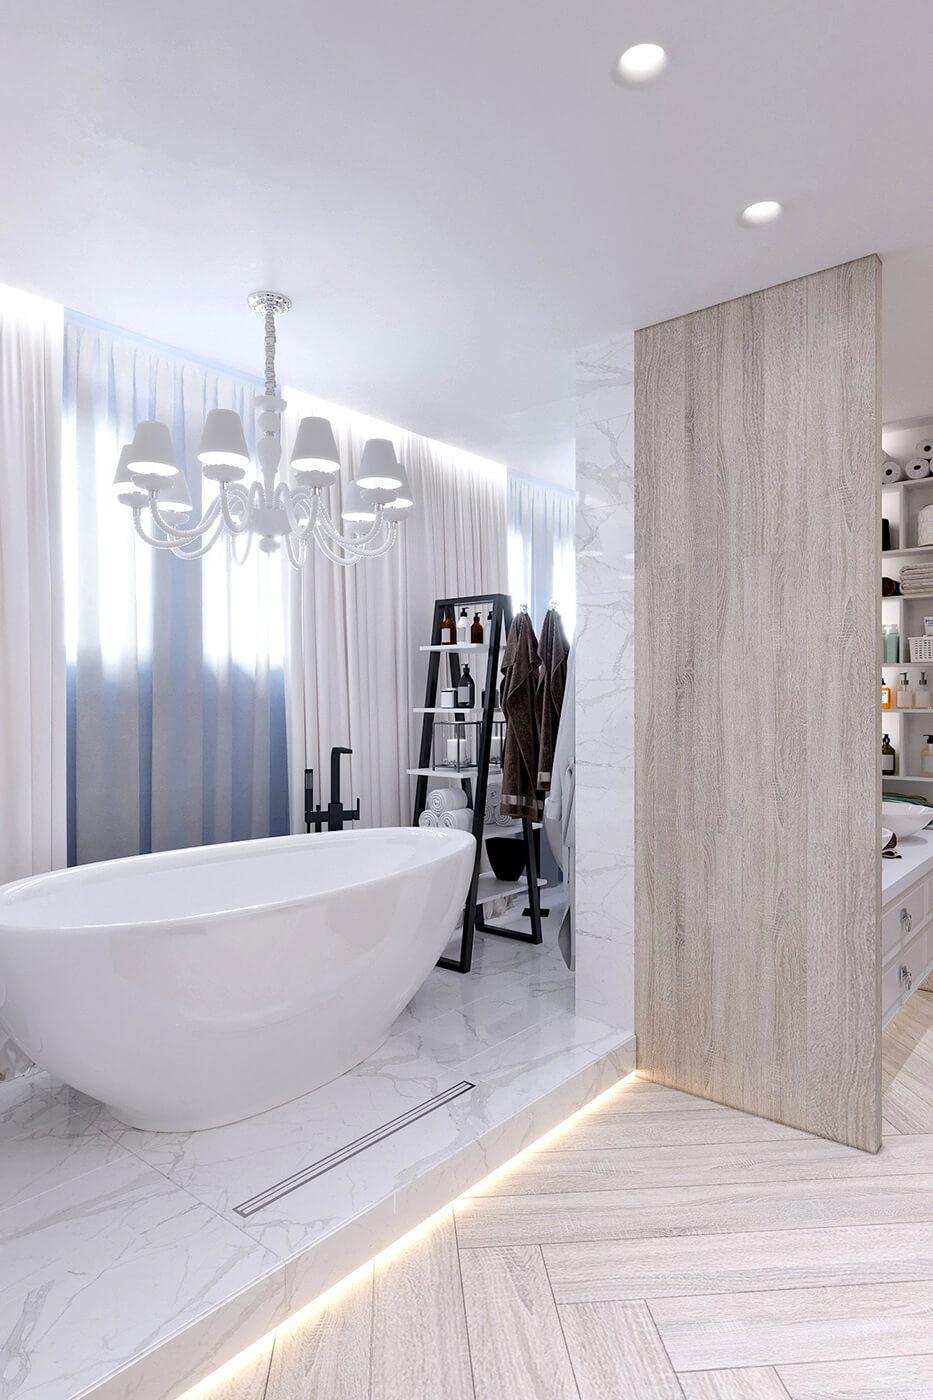 Ванная комната квартира ЖК Триуфм Астана. Дизайн интерьера